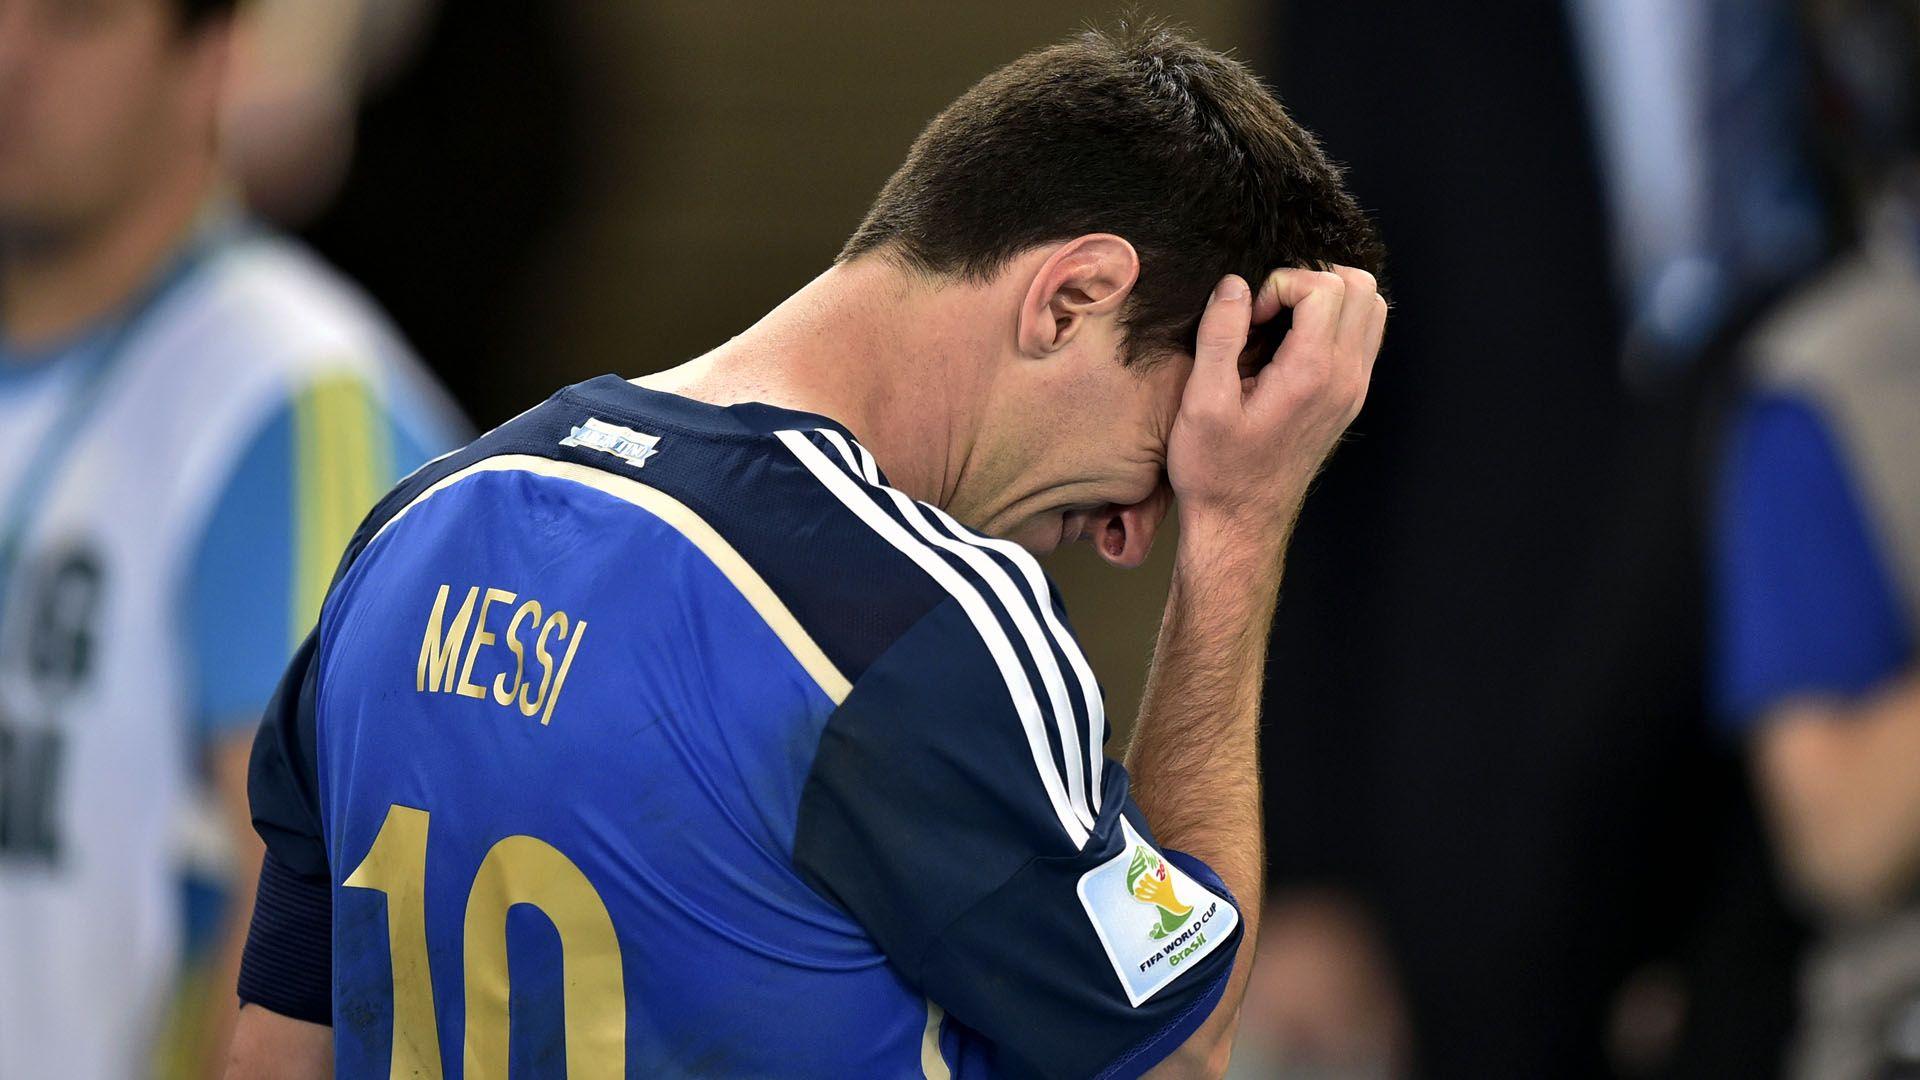 Lionel Messi llorando tras perder la final del Mundial de Brasil 2014